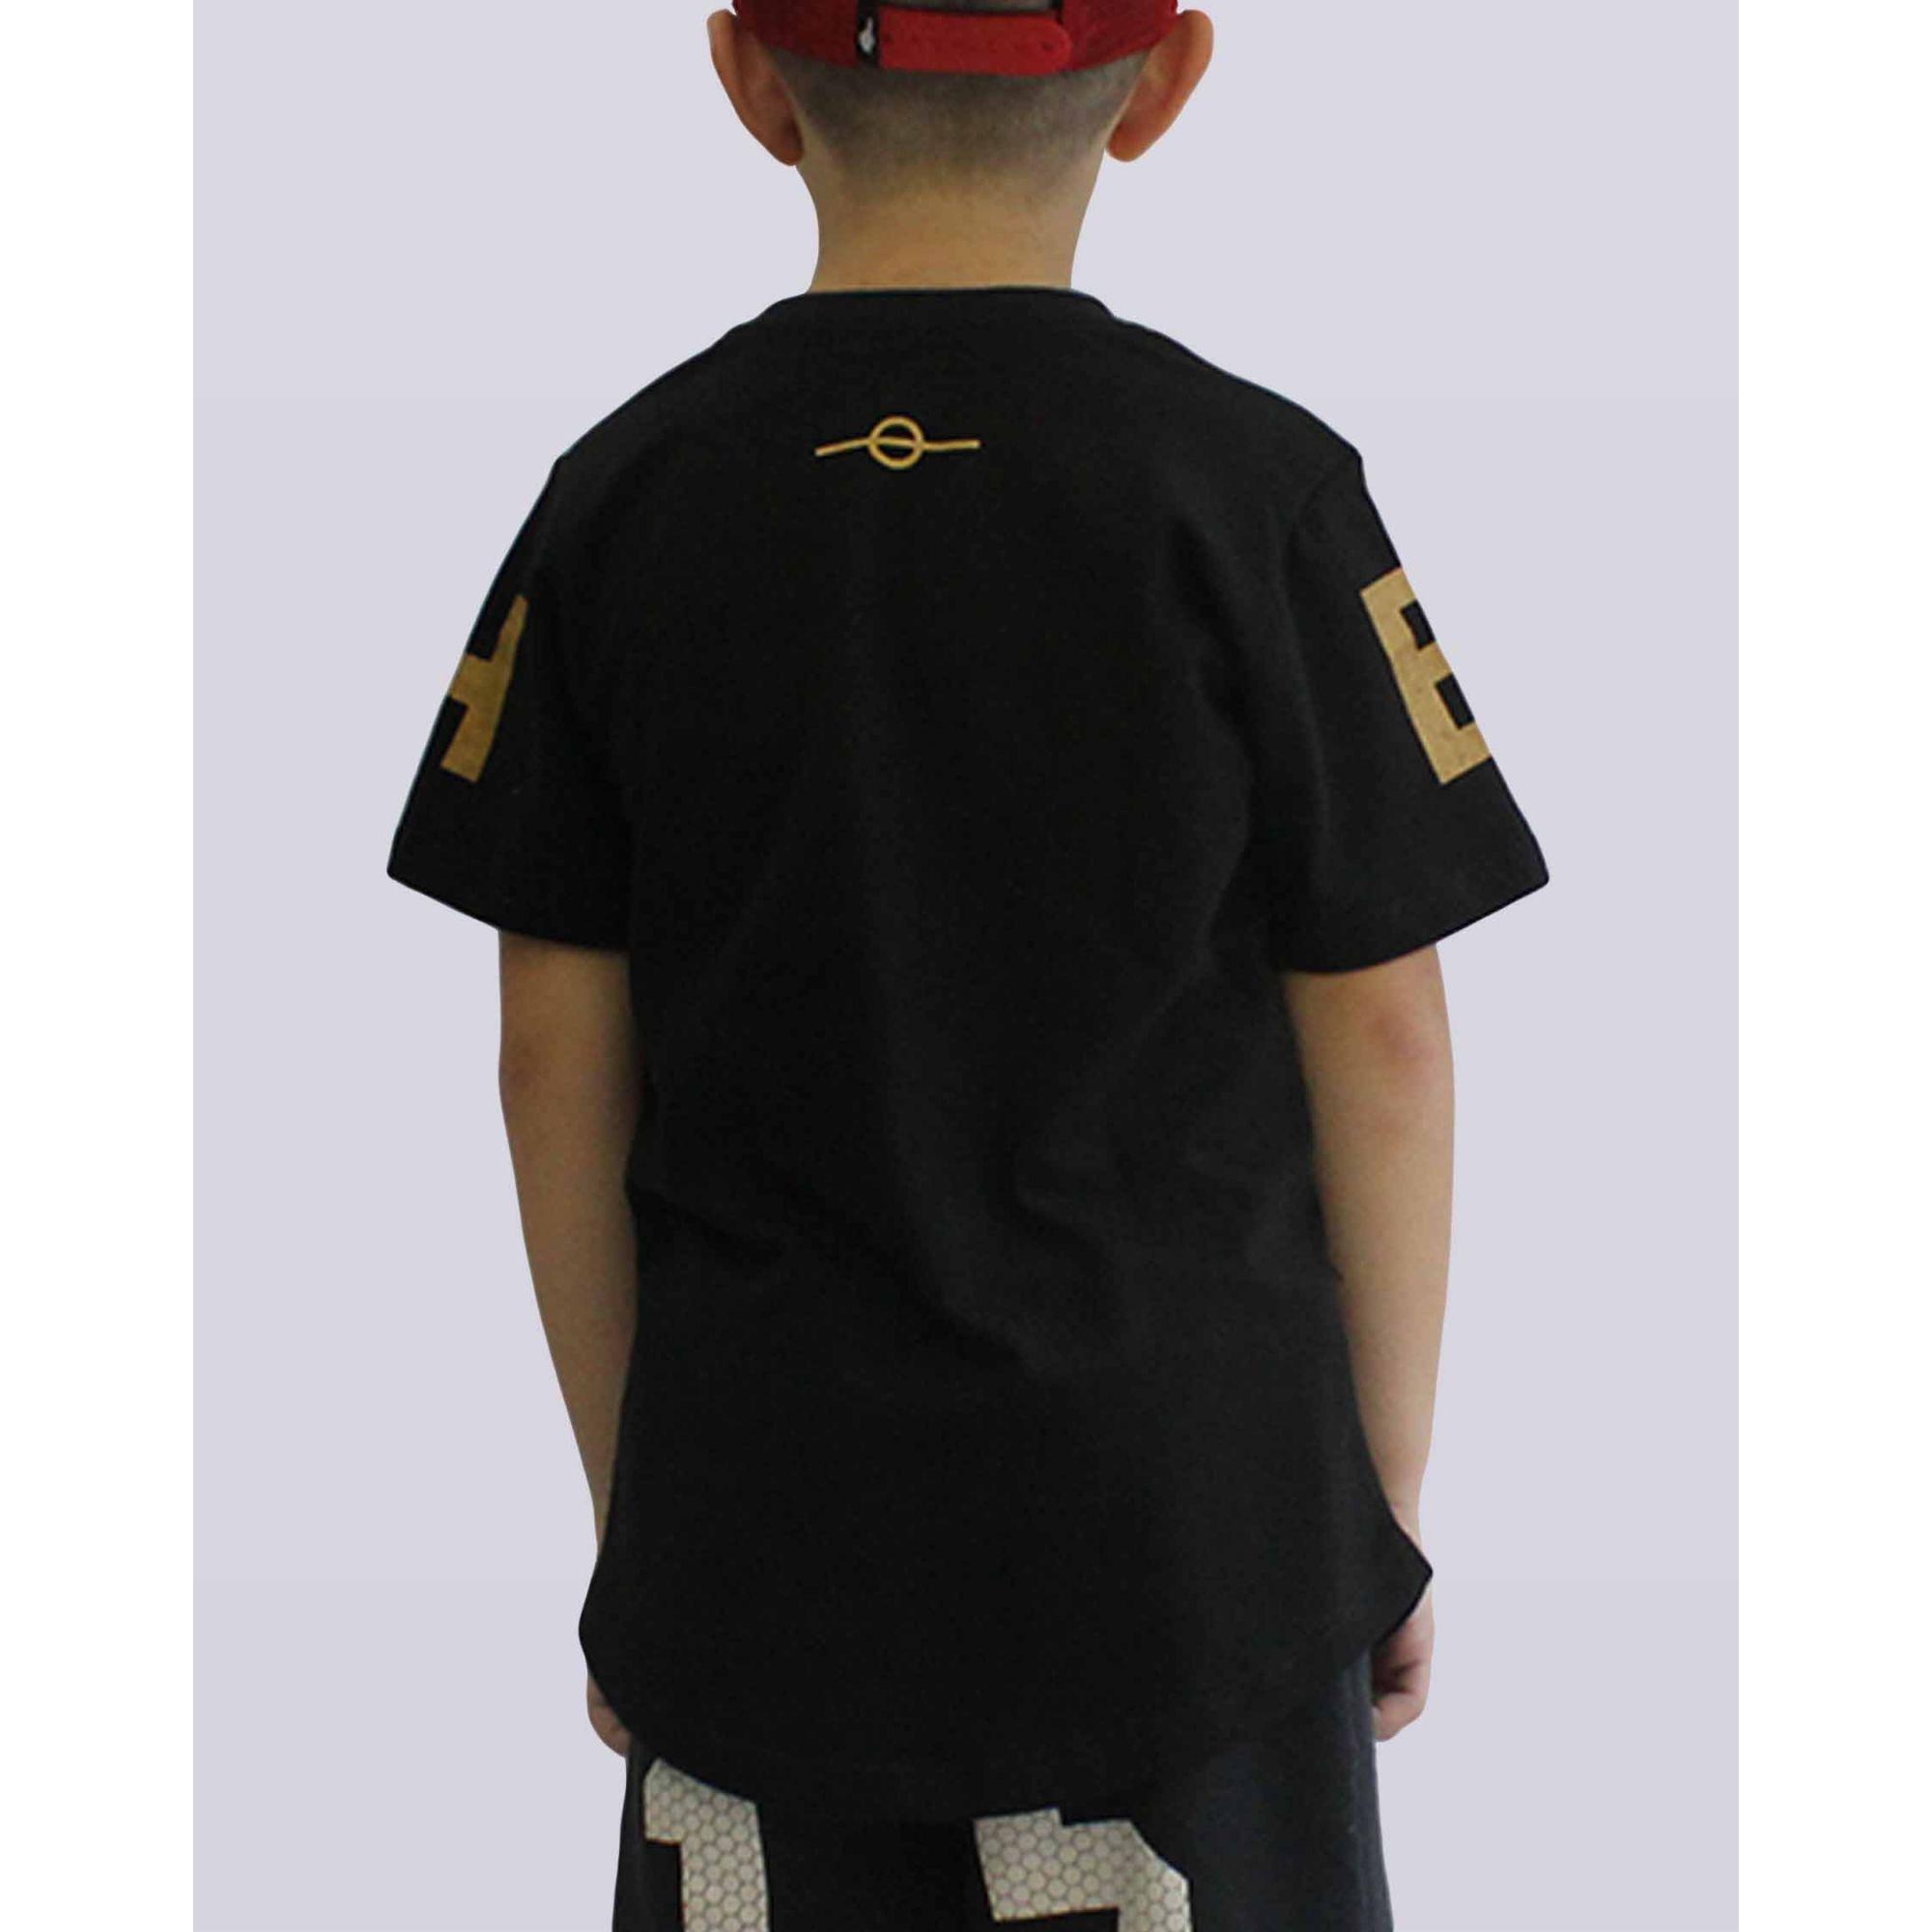 Camiseta Buh Maxxi Letters Black & Gold Kids